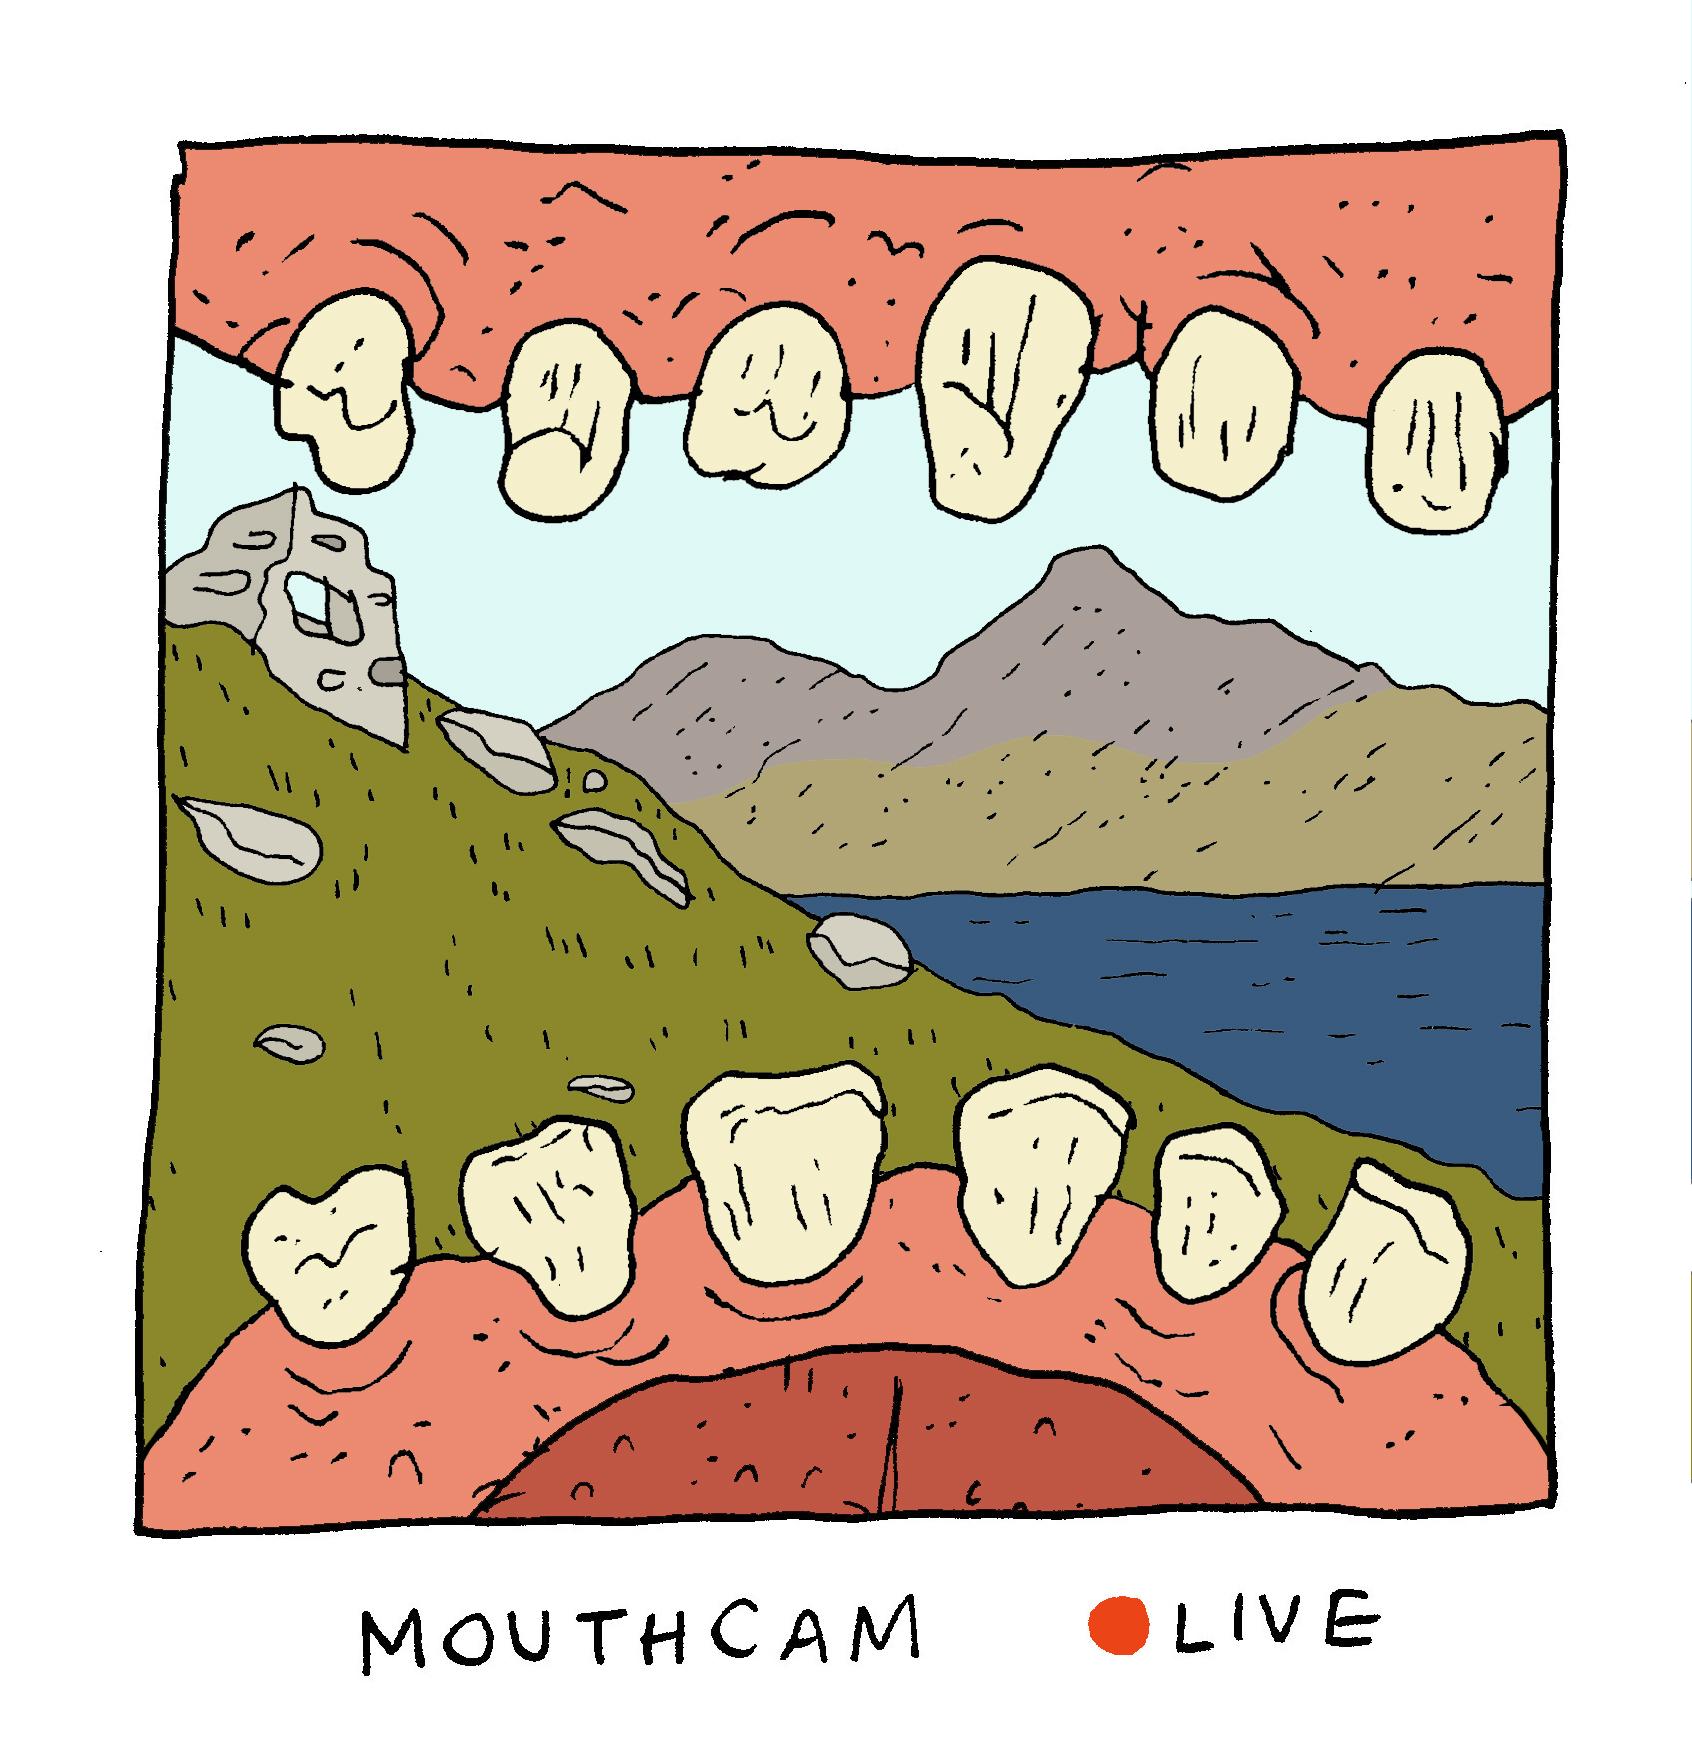 Mouthcam